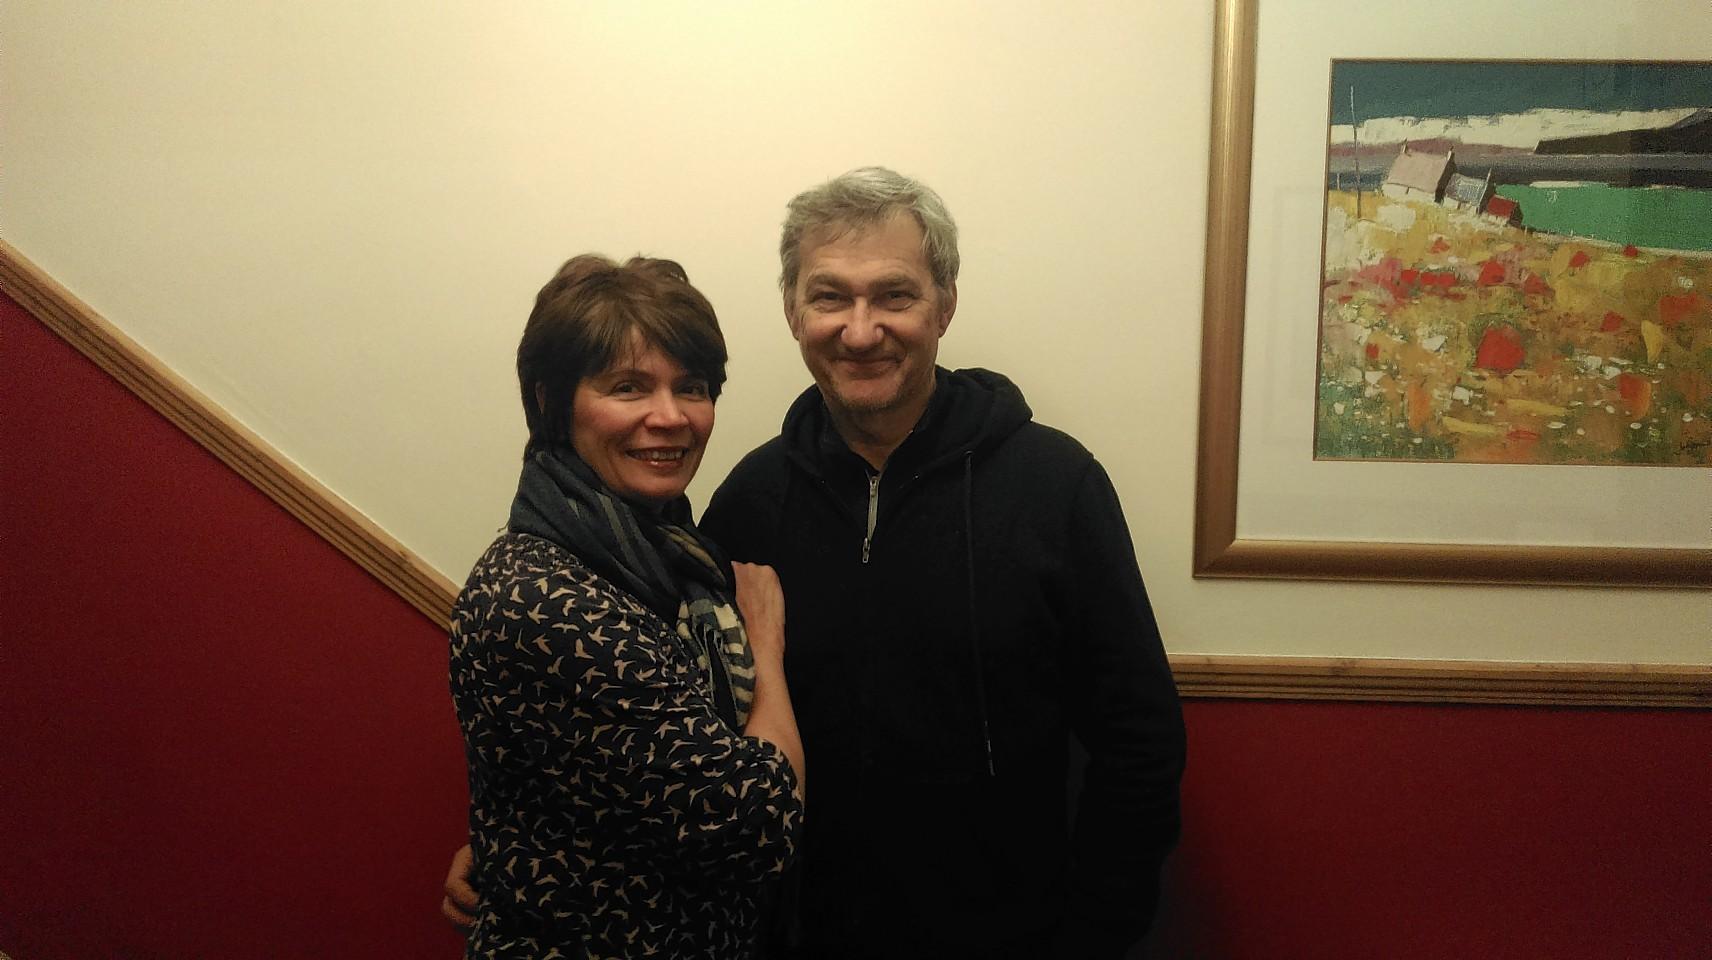 Penny and Steve Macdonald